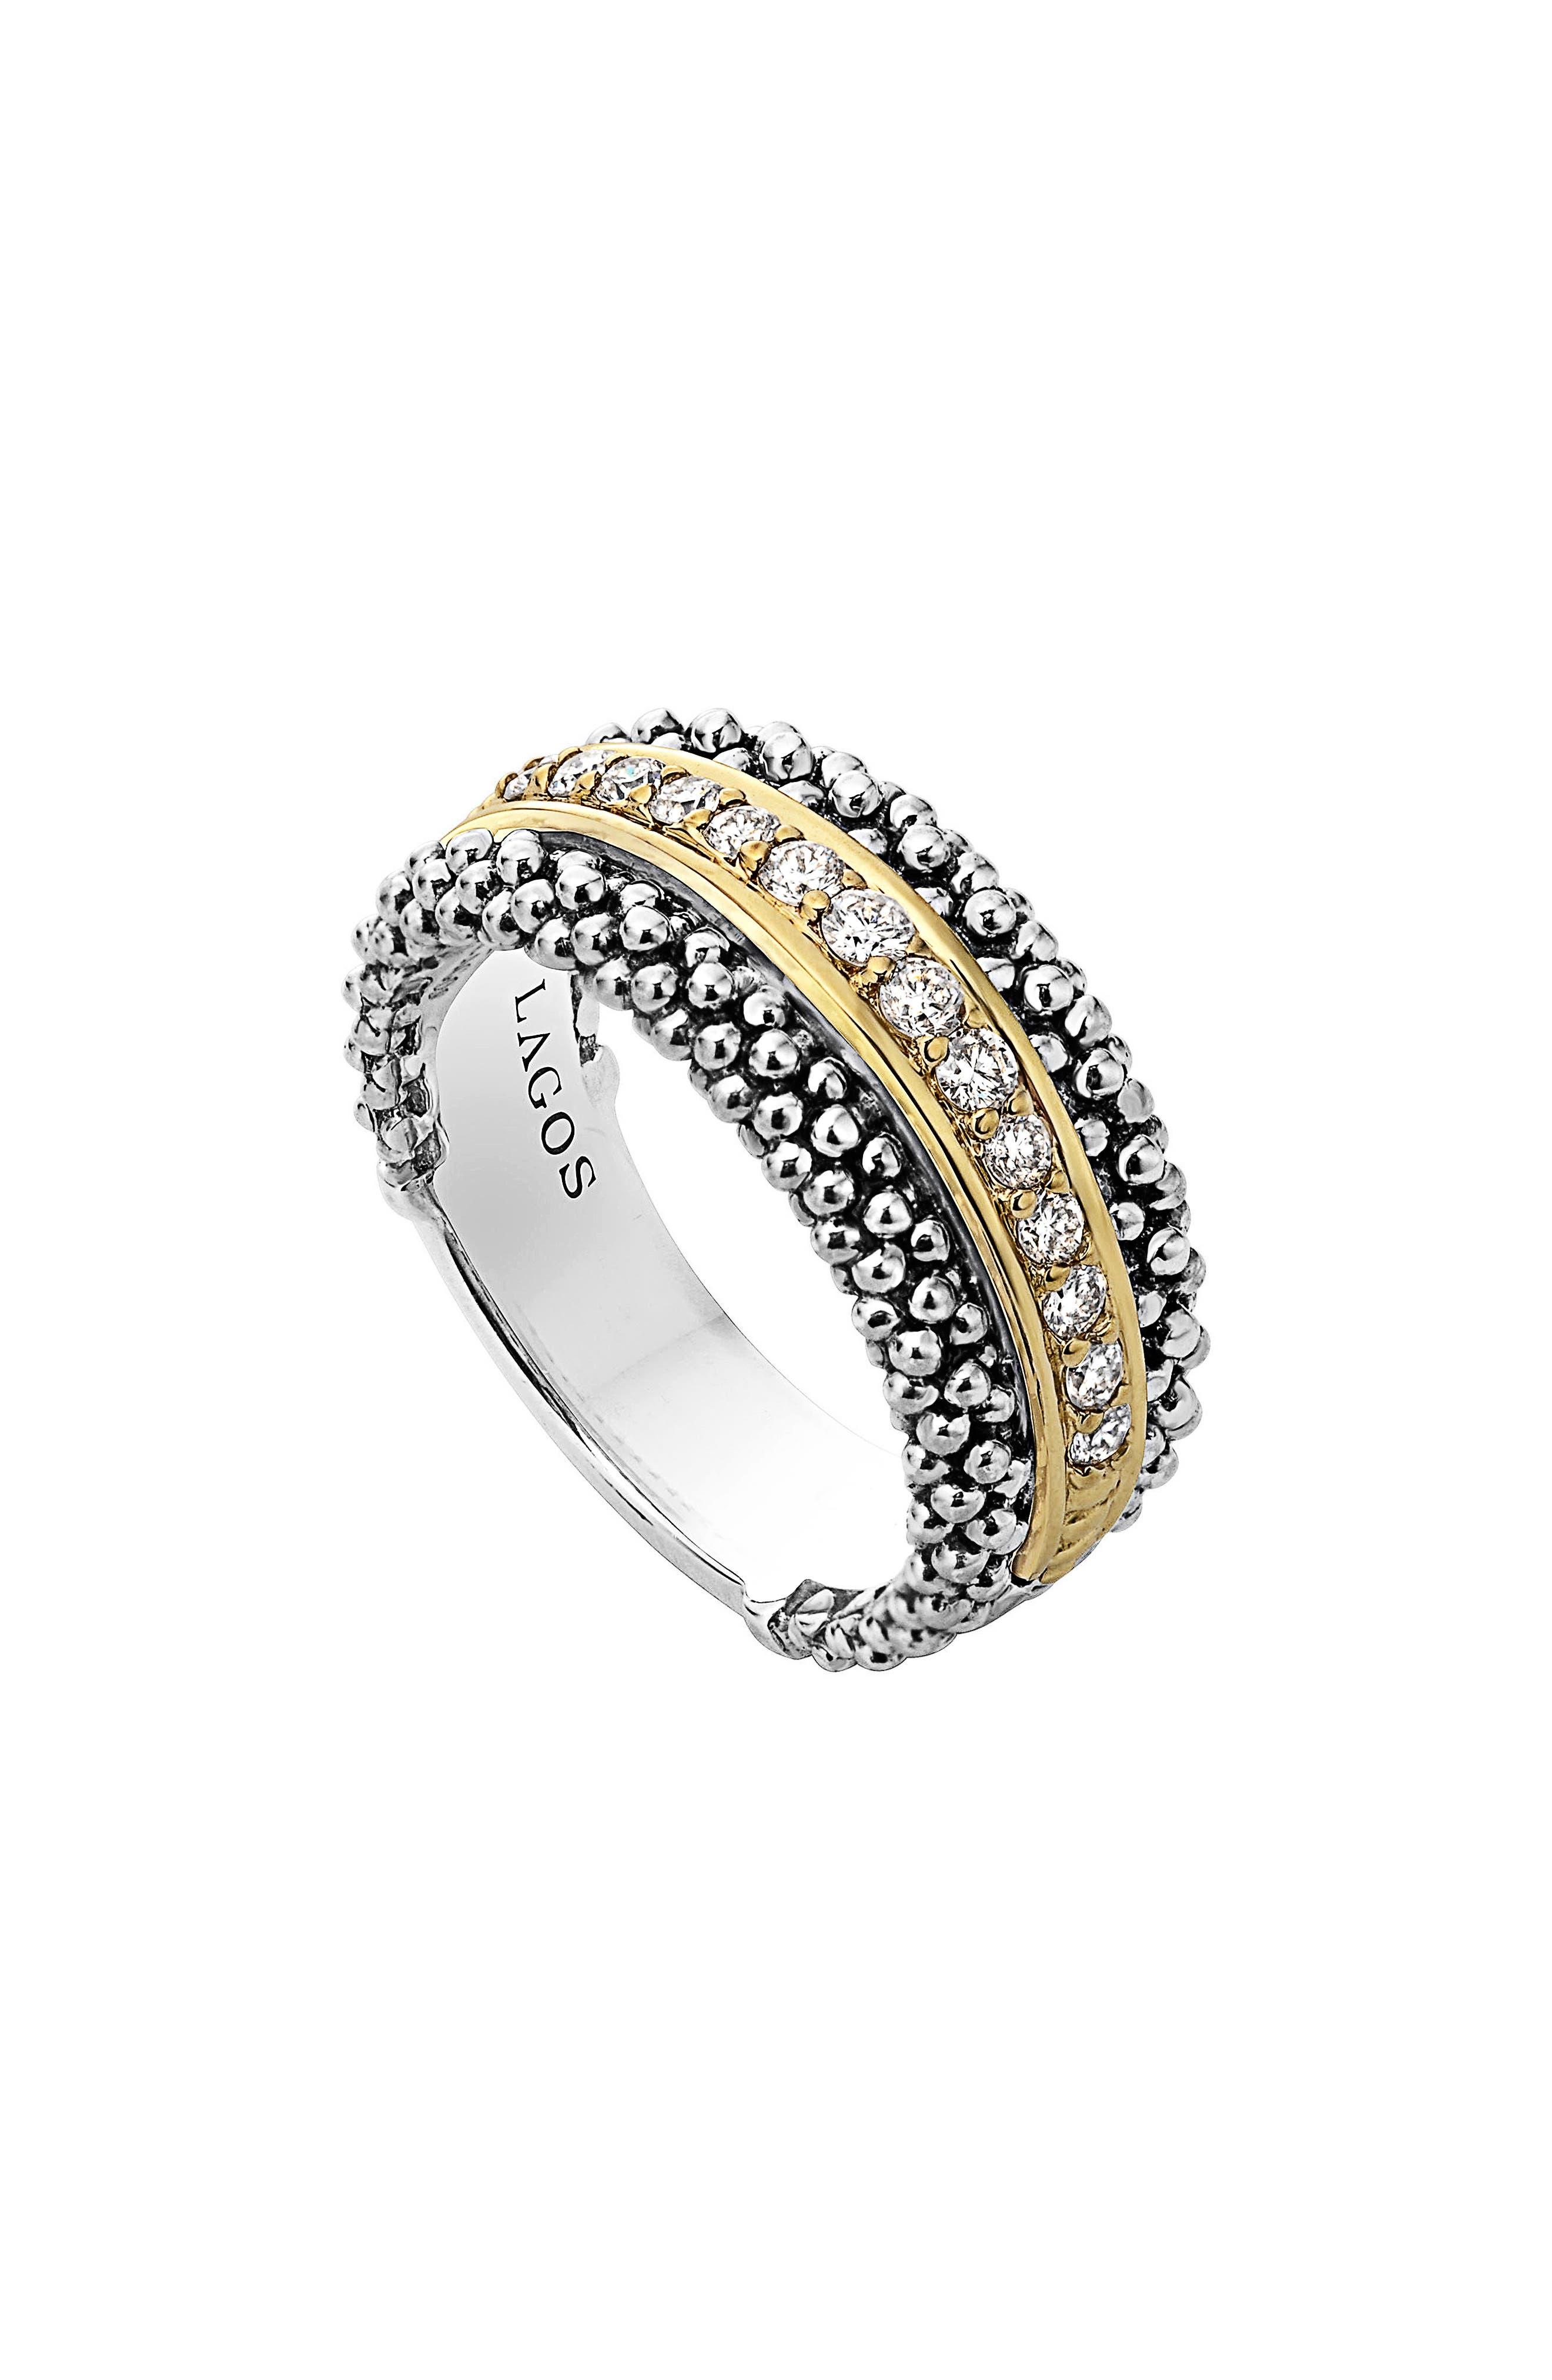 Diamonds & Caviar Ring,                             Main thumbnail 1, color,                             Silver/ Gold